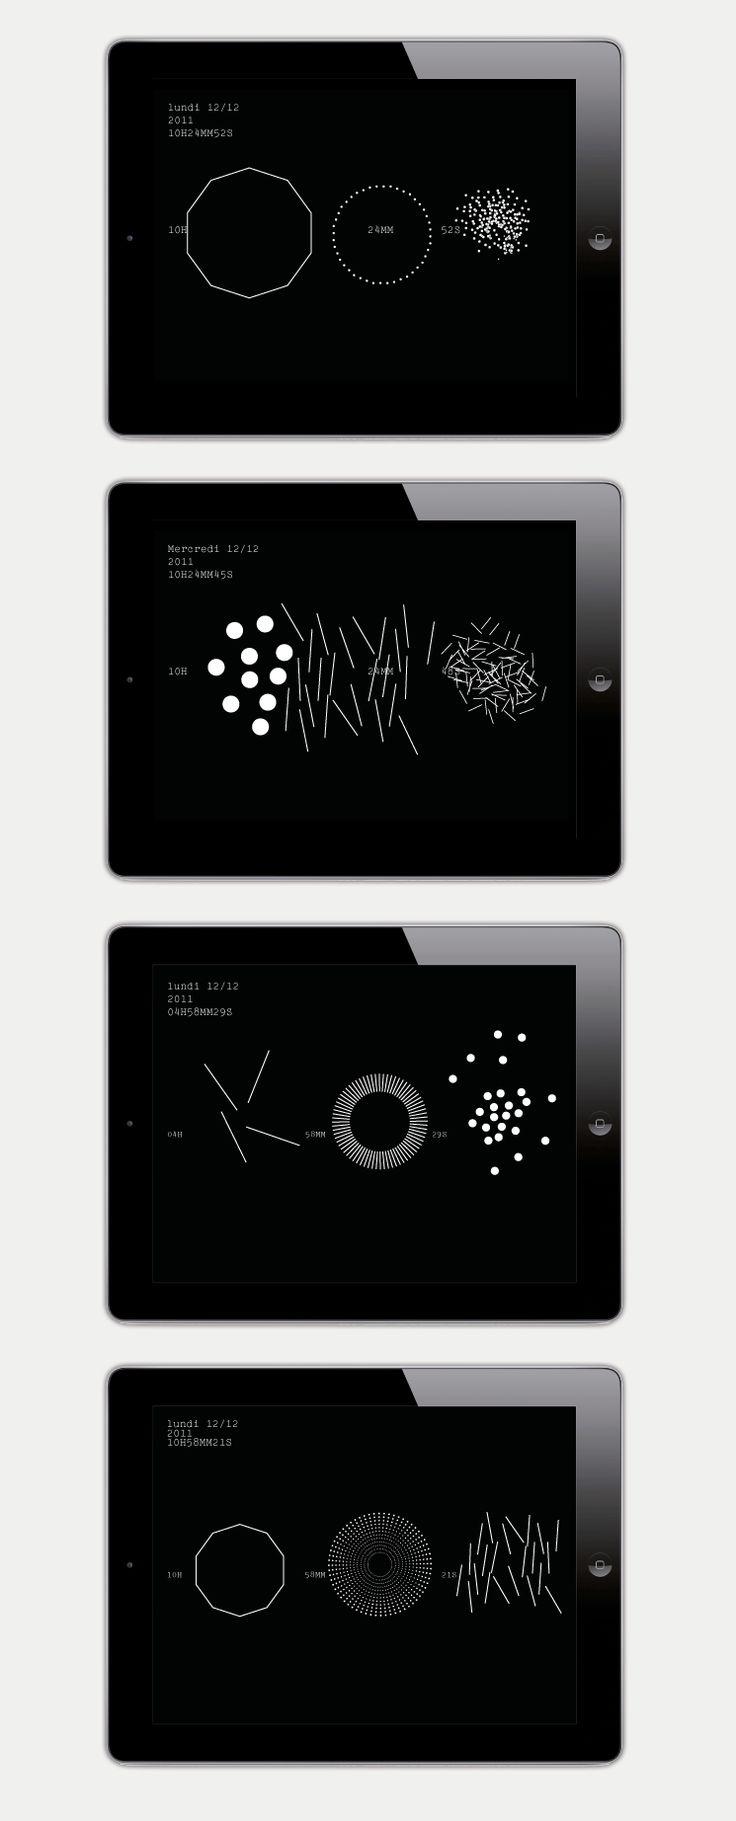 Trafik - graphic design, website, multi-media, scenography, exhibitions